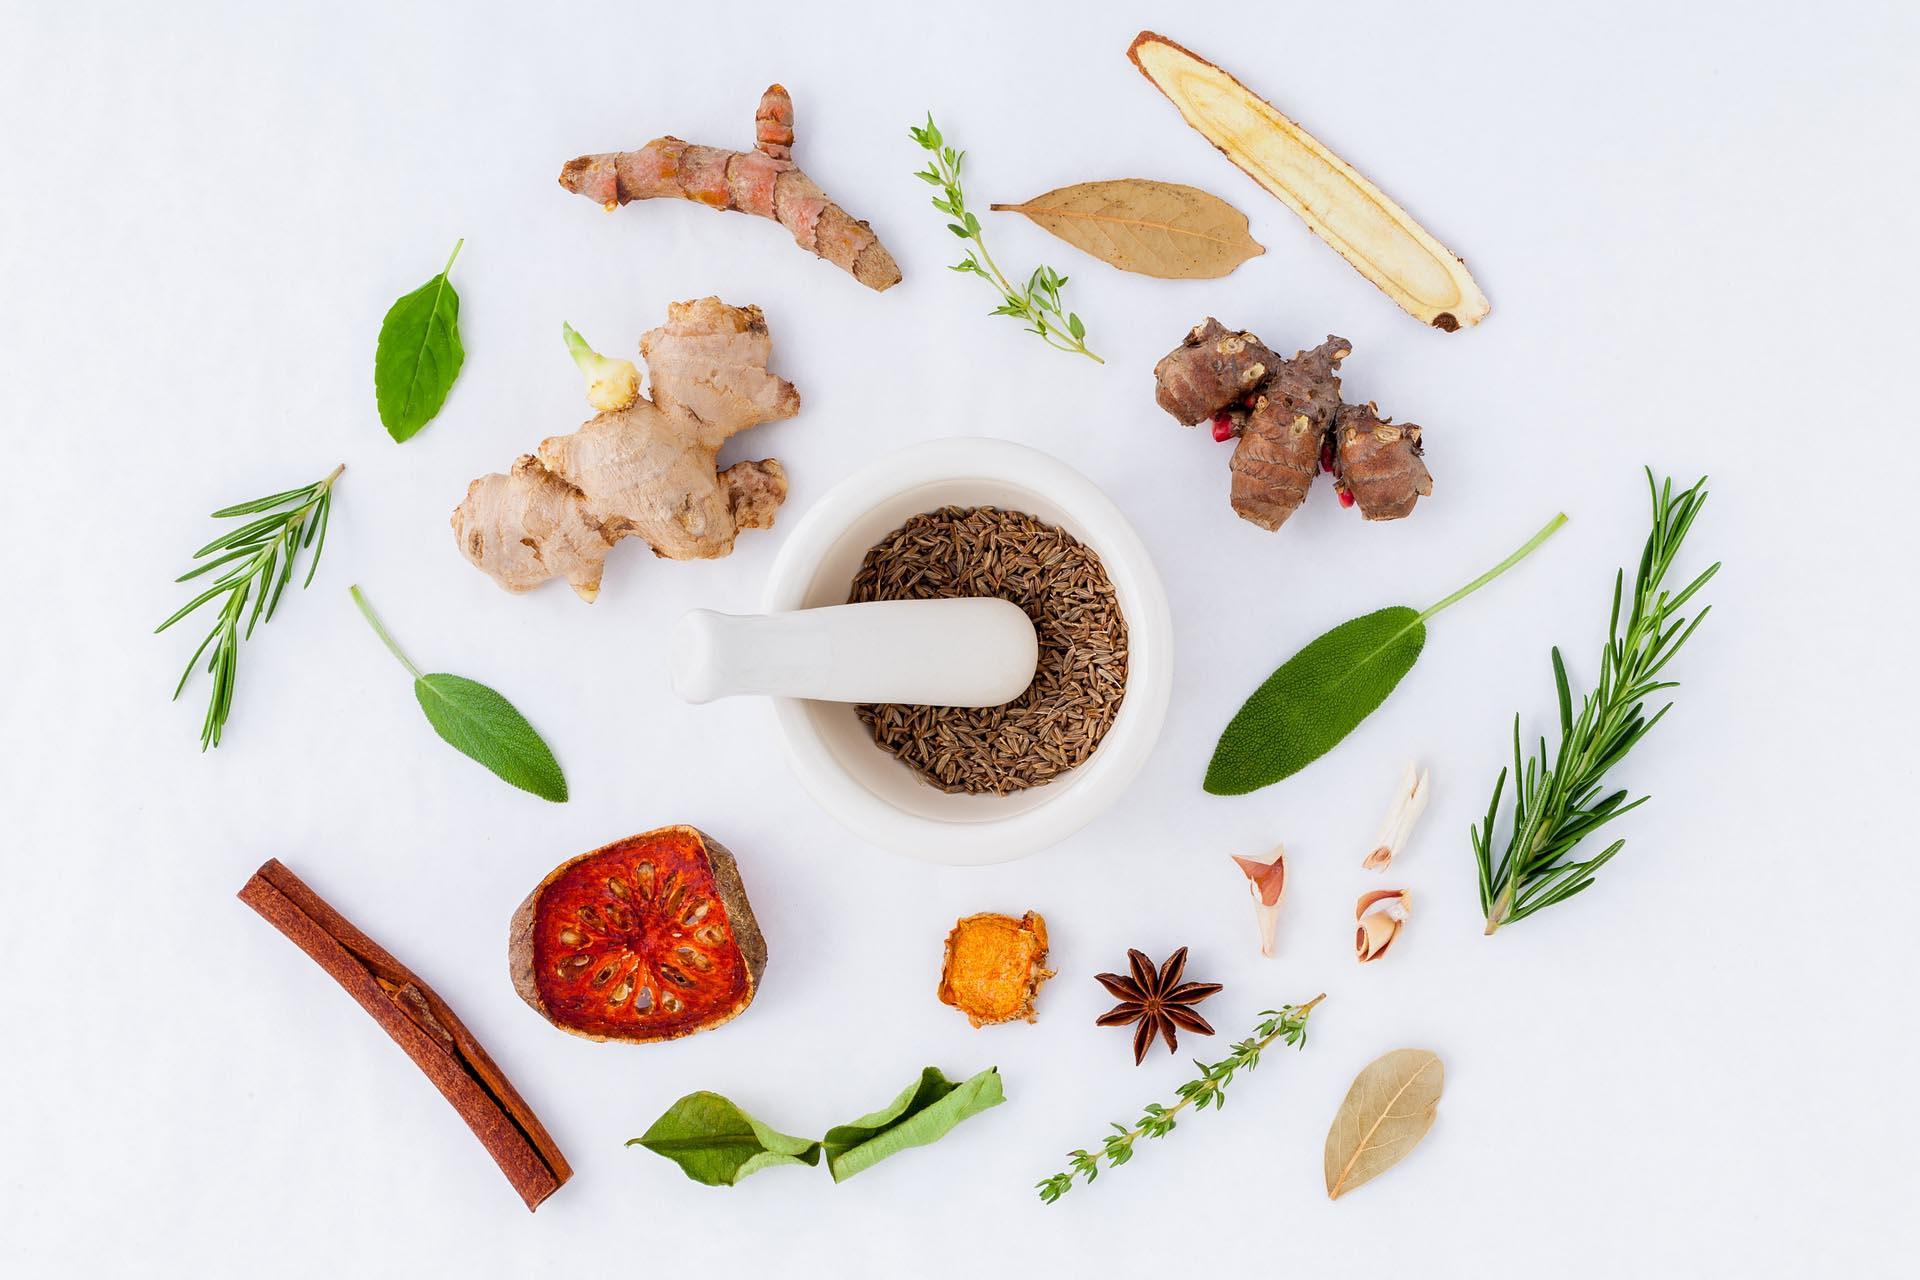 le spezie medicinali